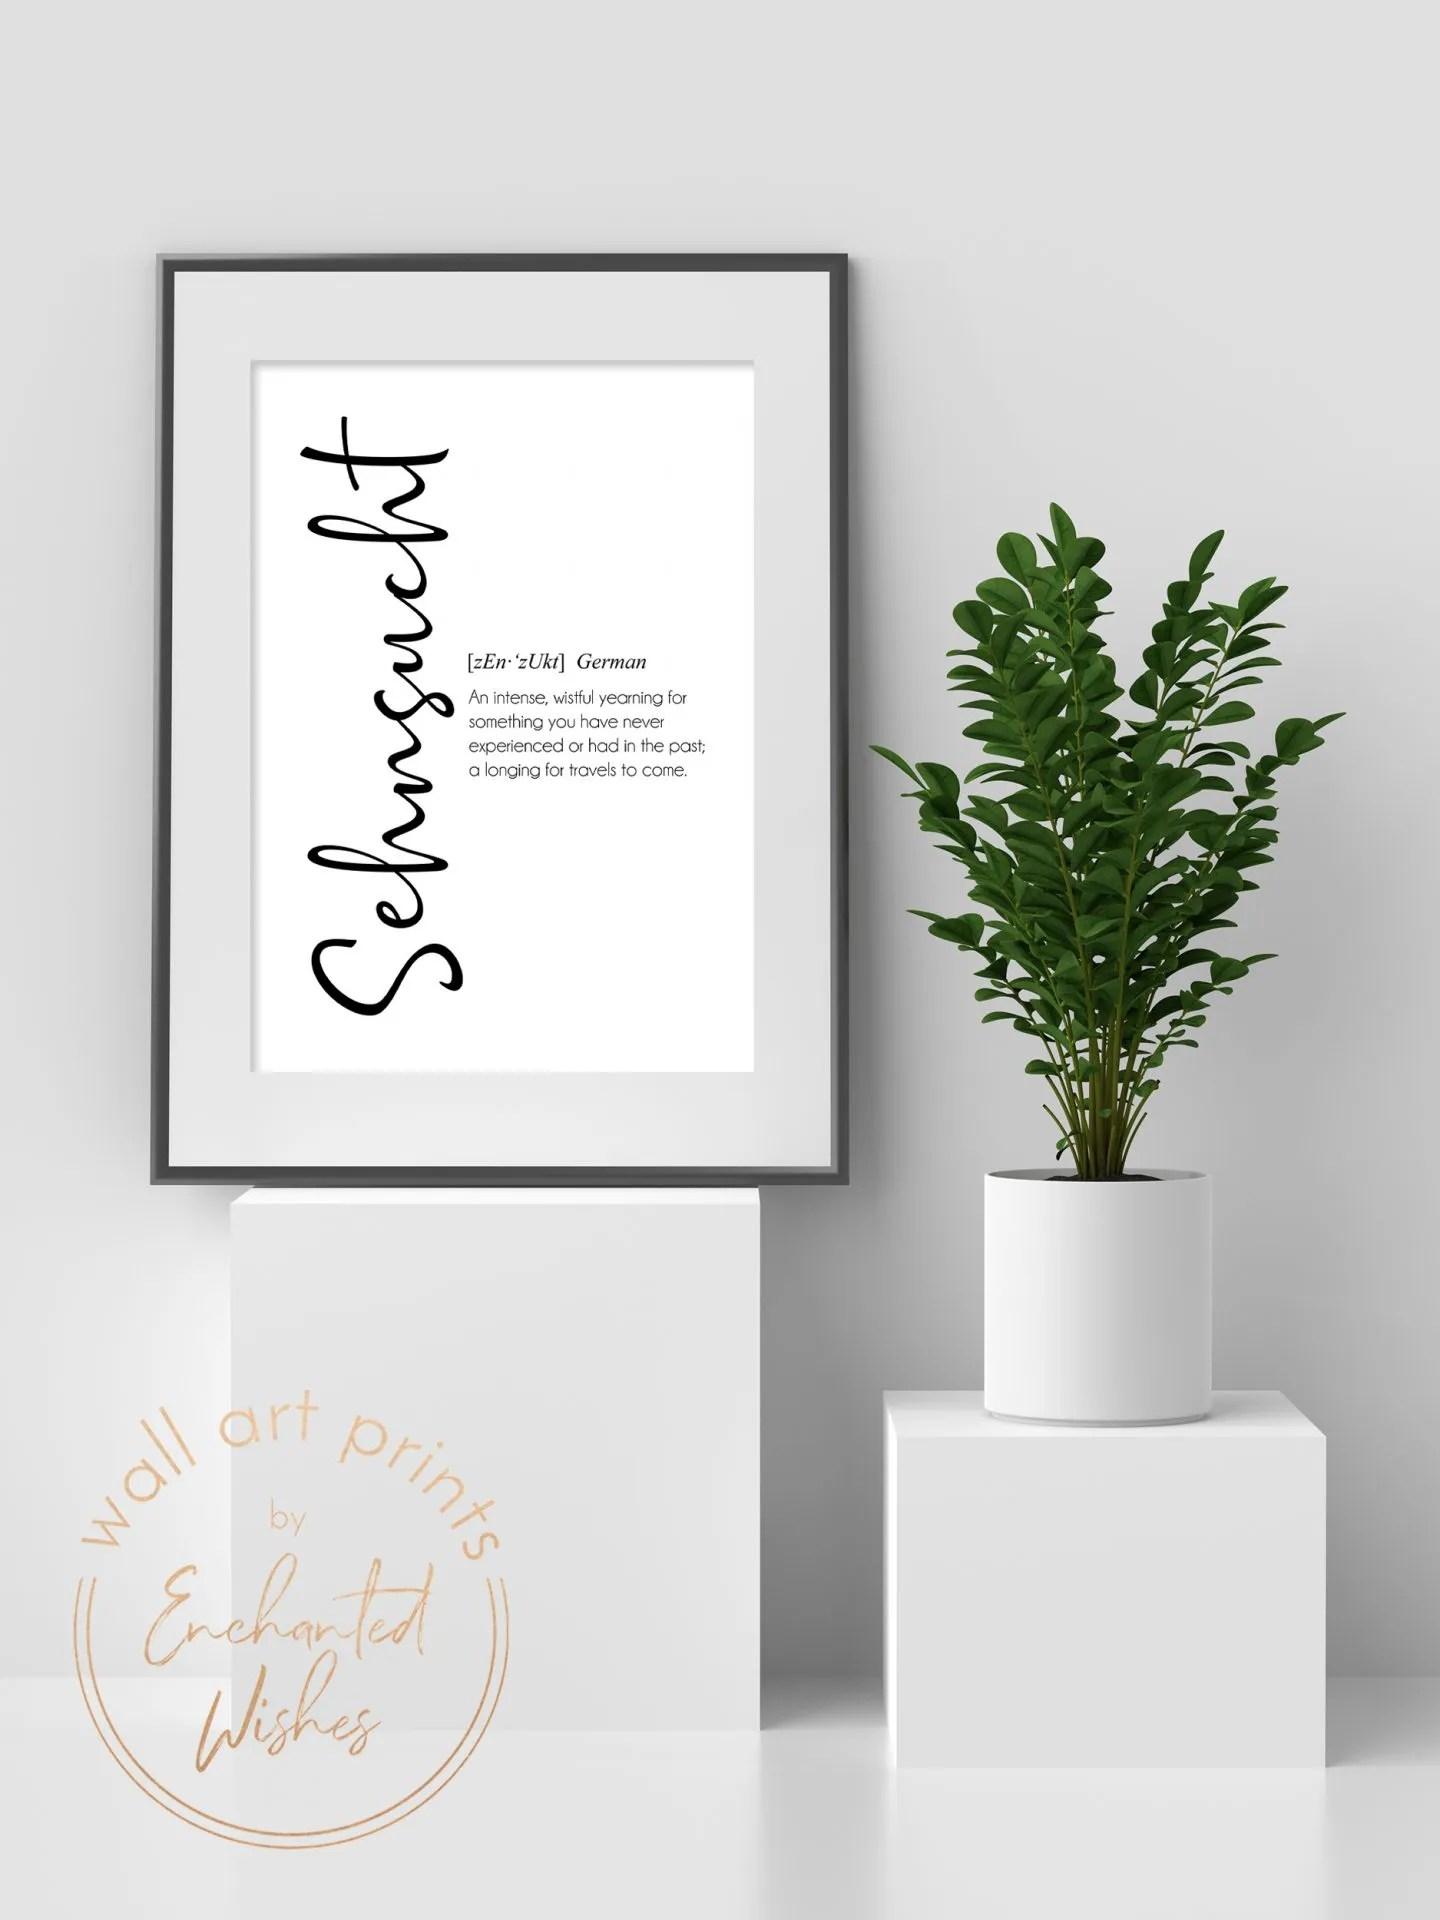 Sehnsucht definition print